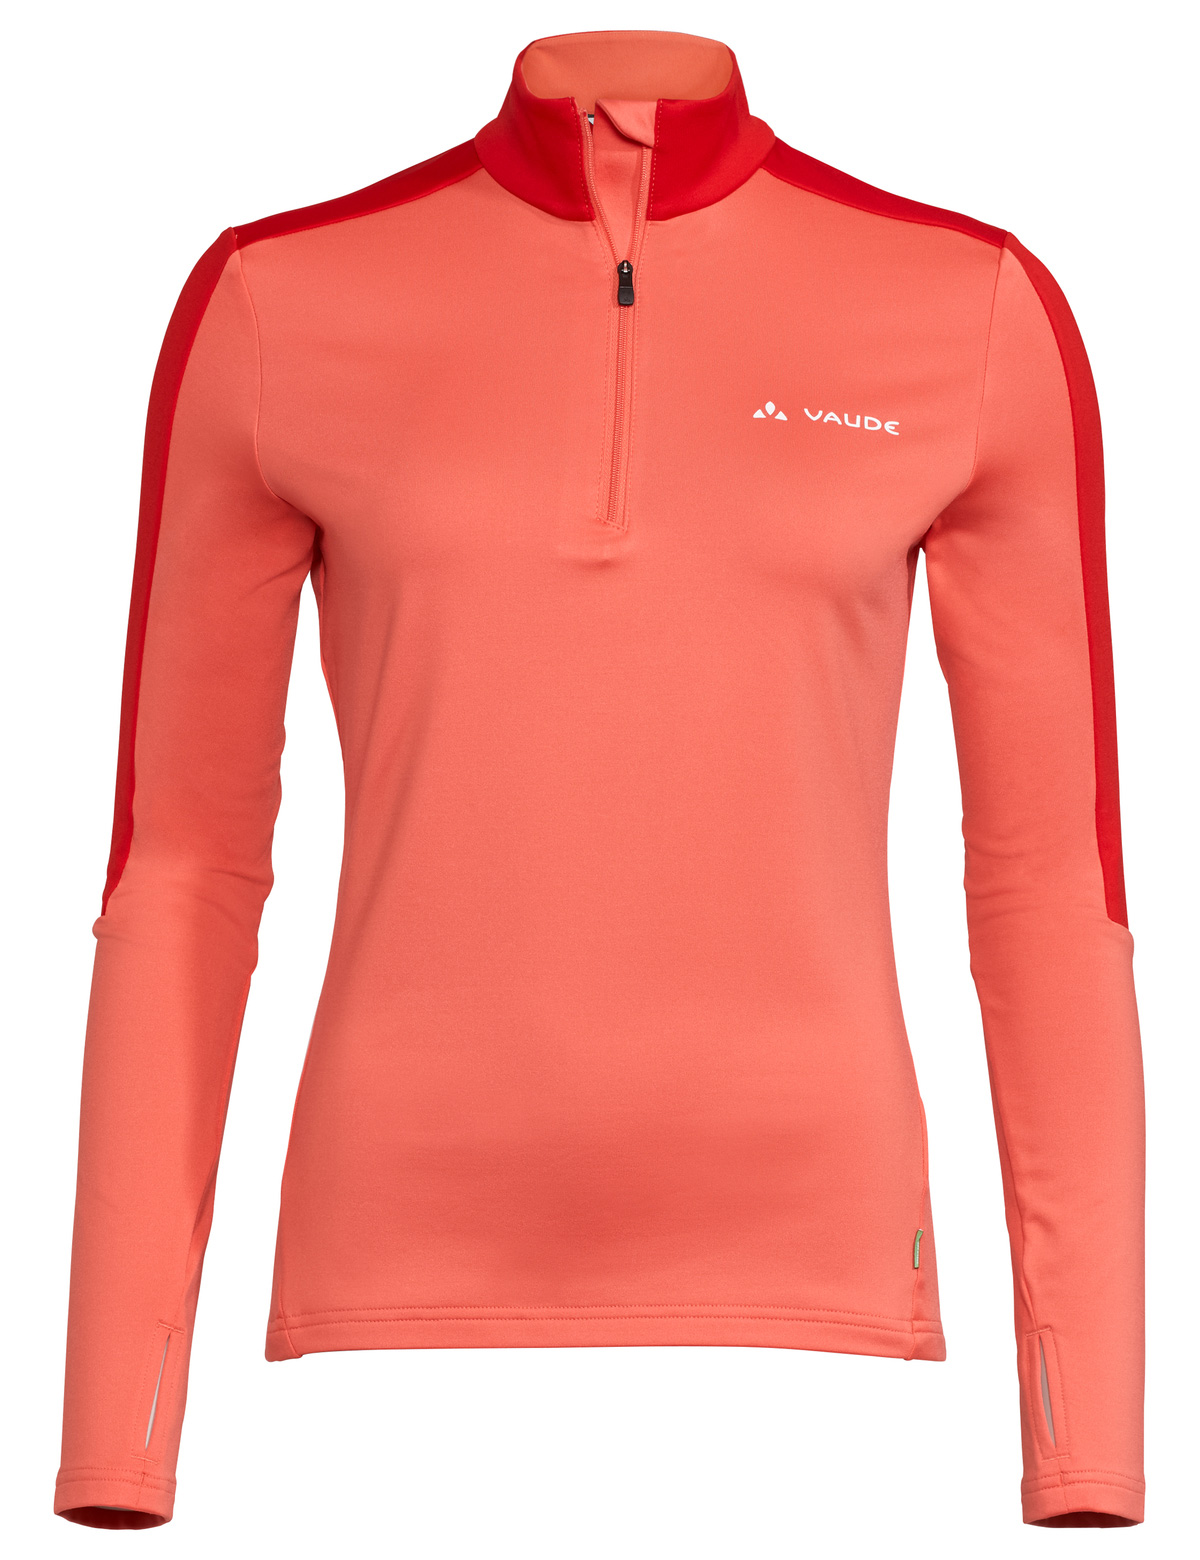 Vaude Livigno Halfzip II Damen Shirt - pink canary